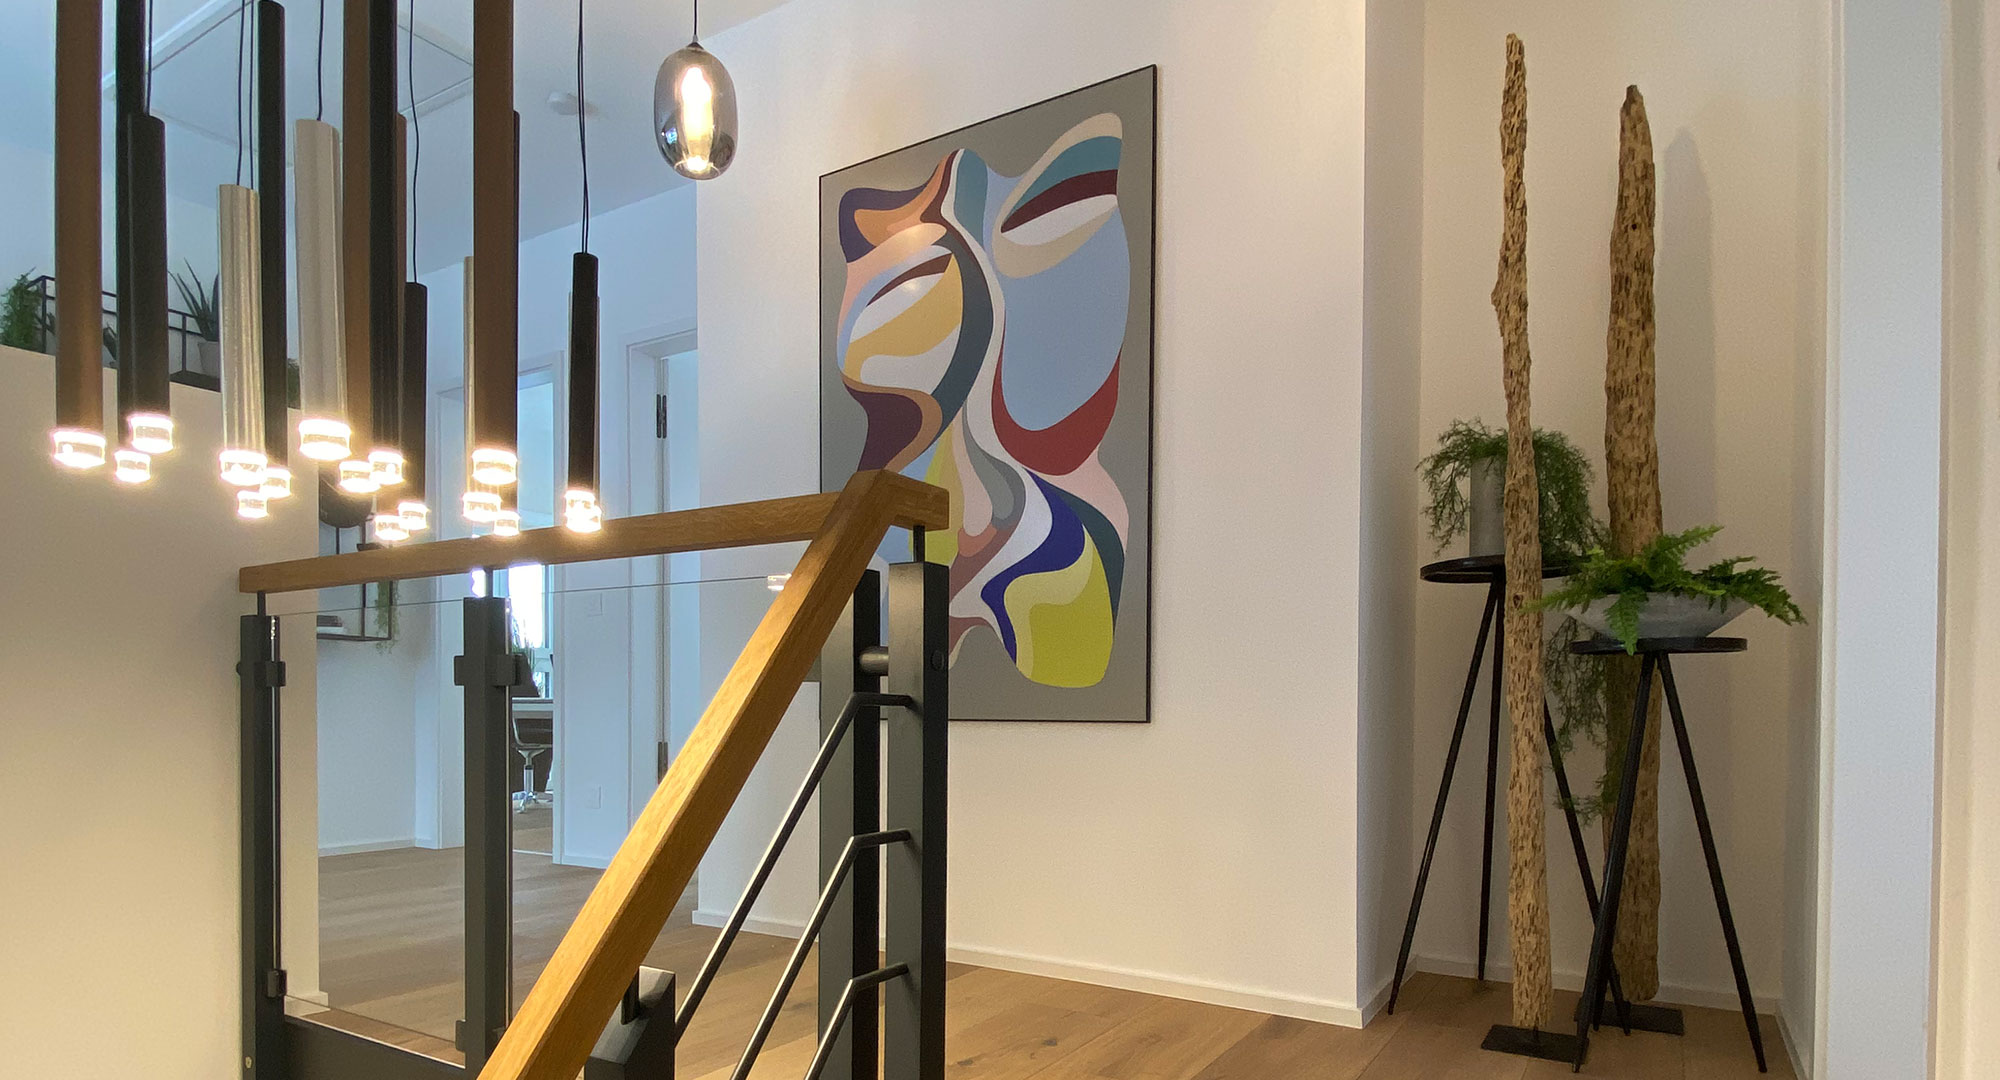 Treppenaufgang - Raum, Energie, Design - Eva Stallinger